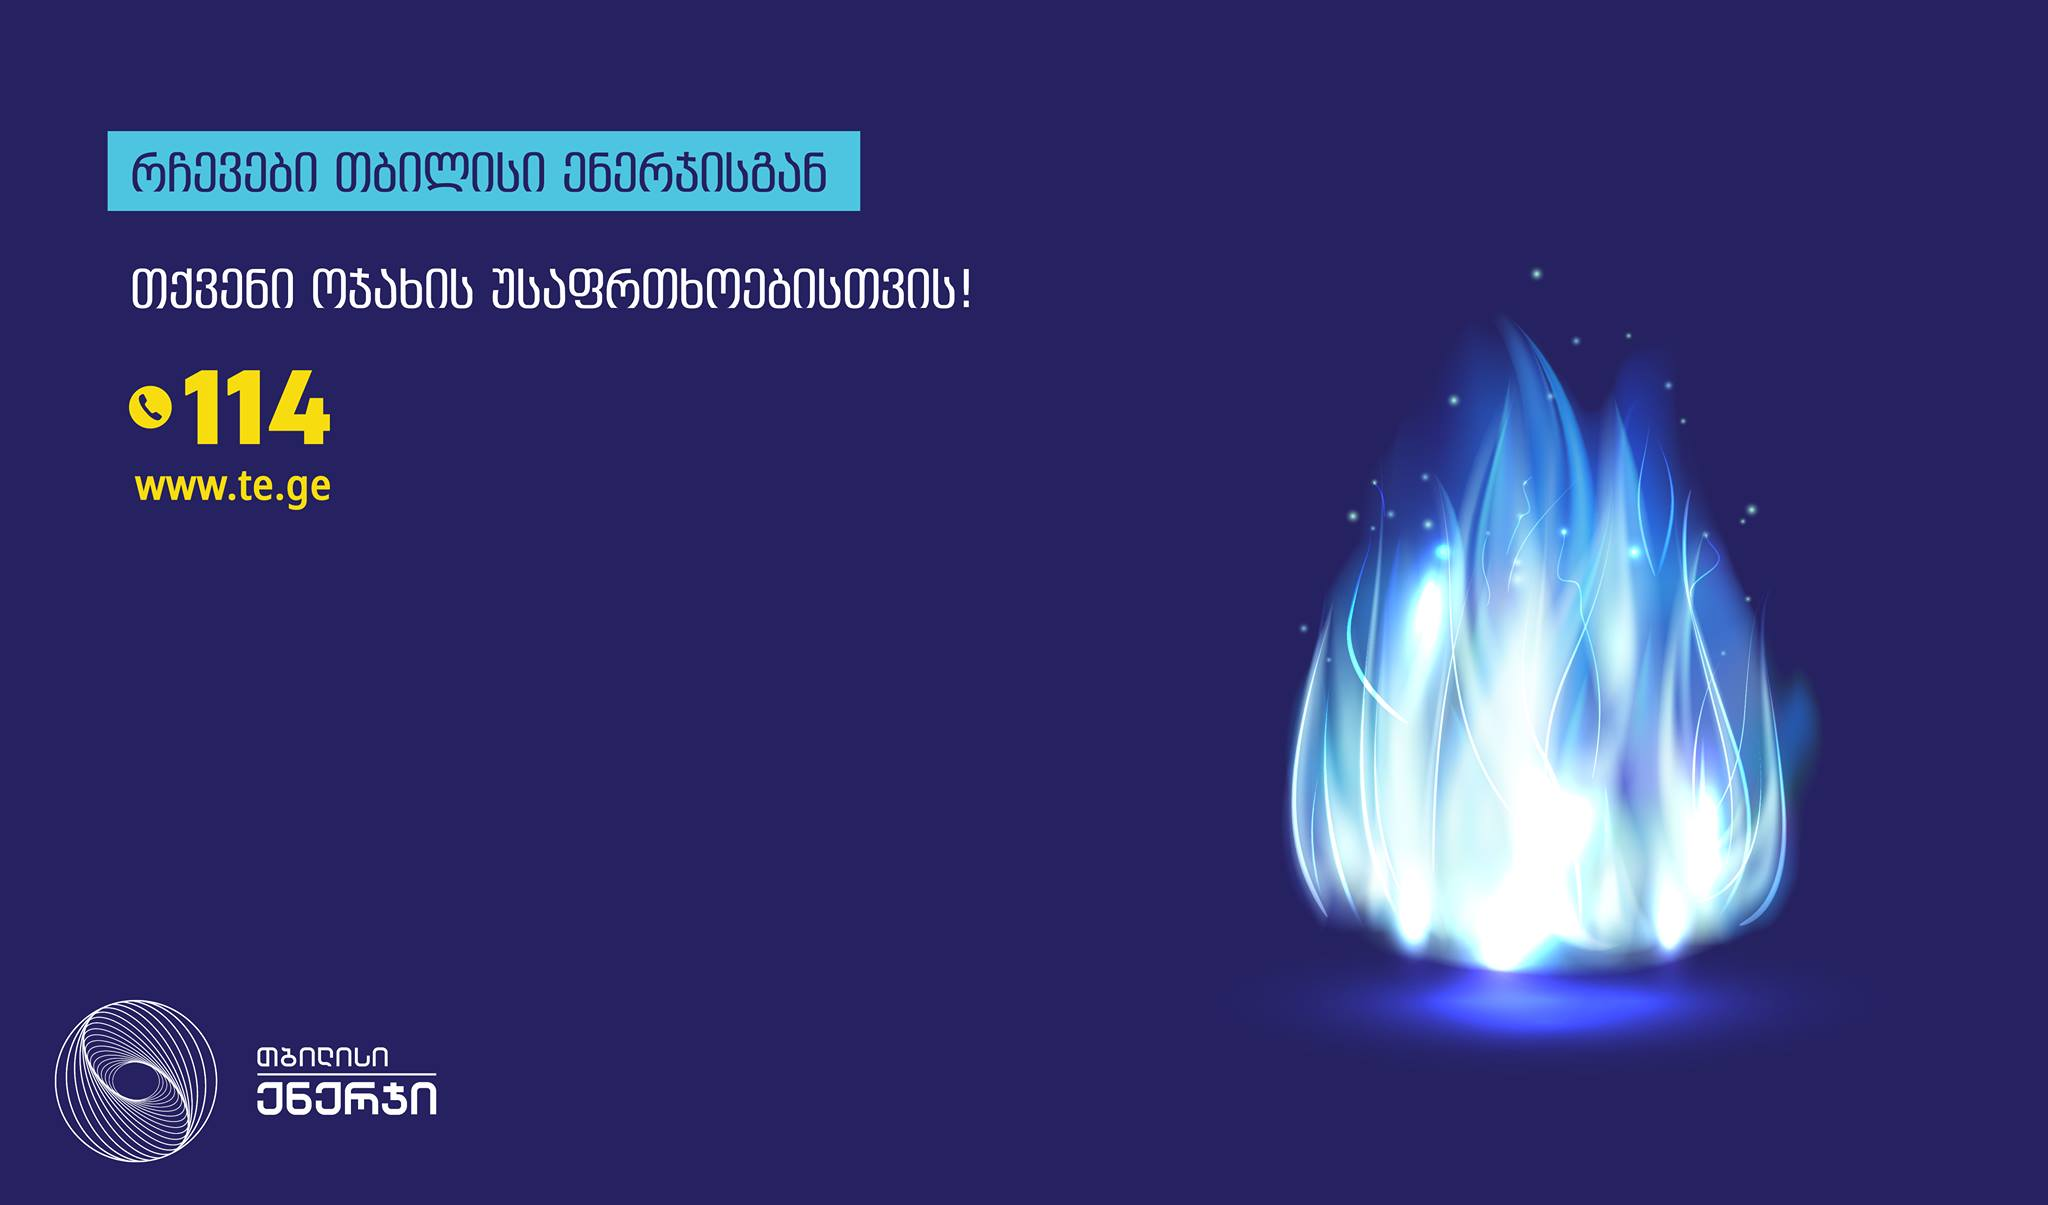 kompania-Tbilisi-enerji-gafrTxilebT